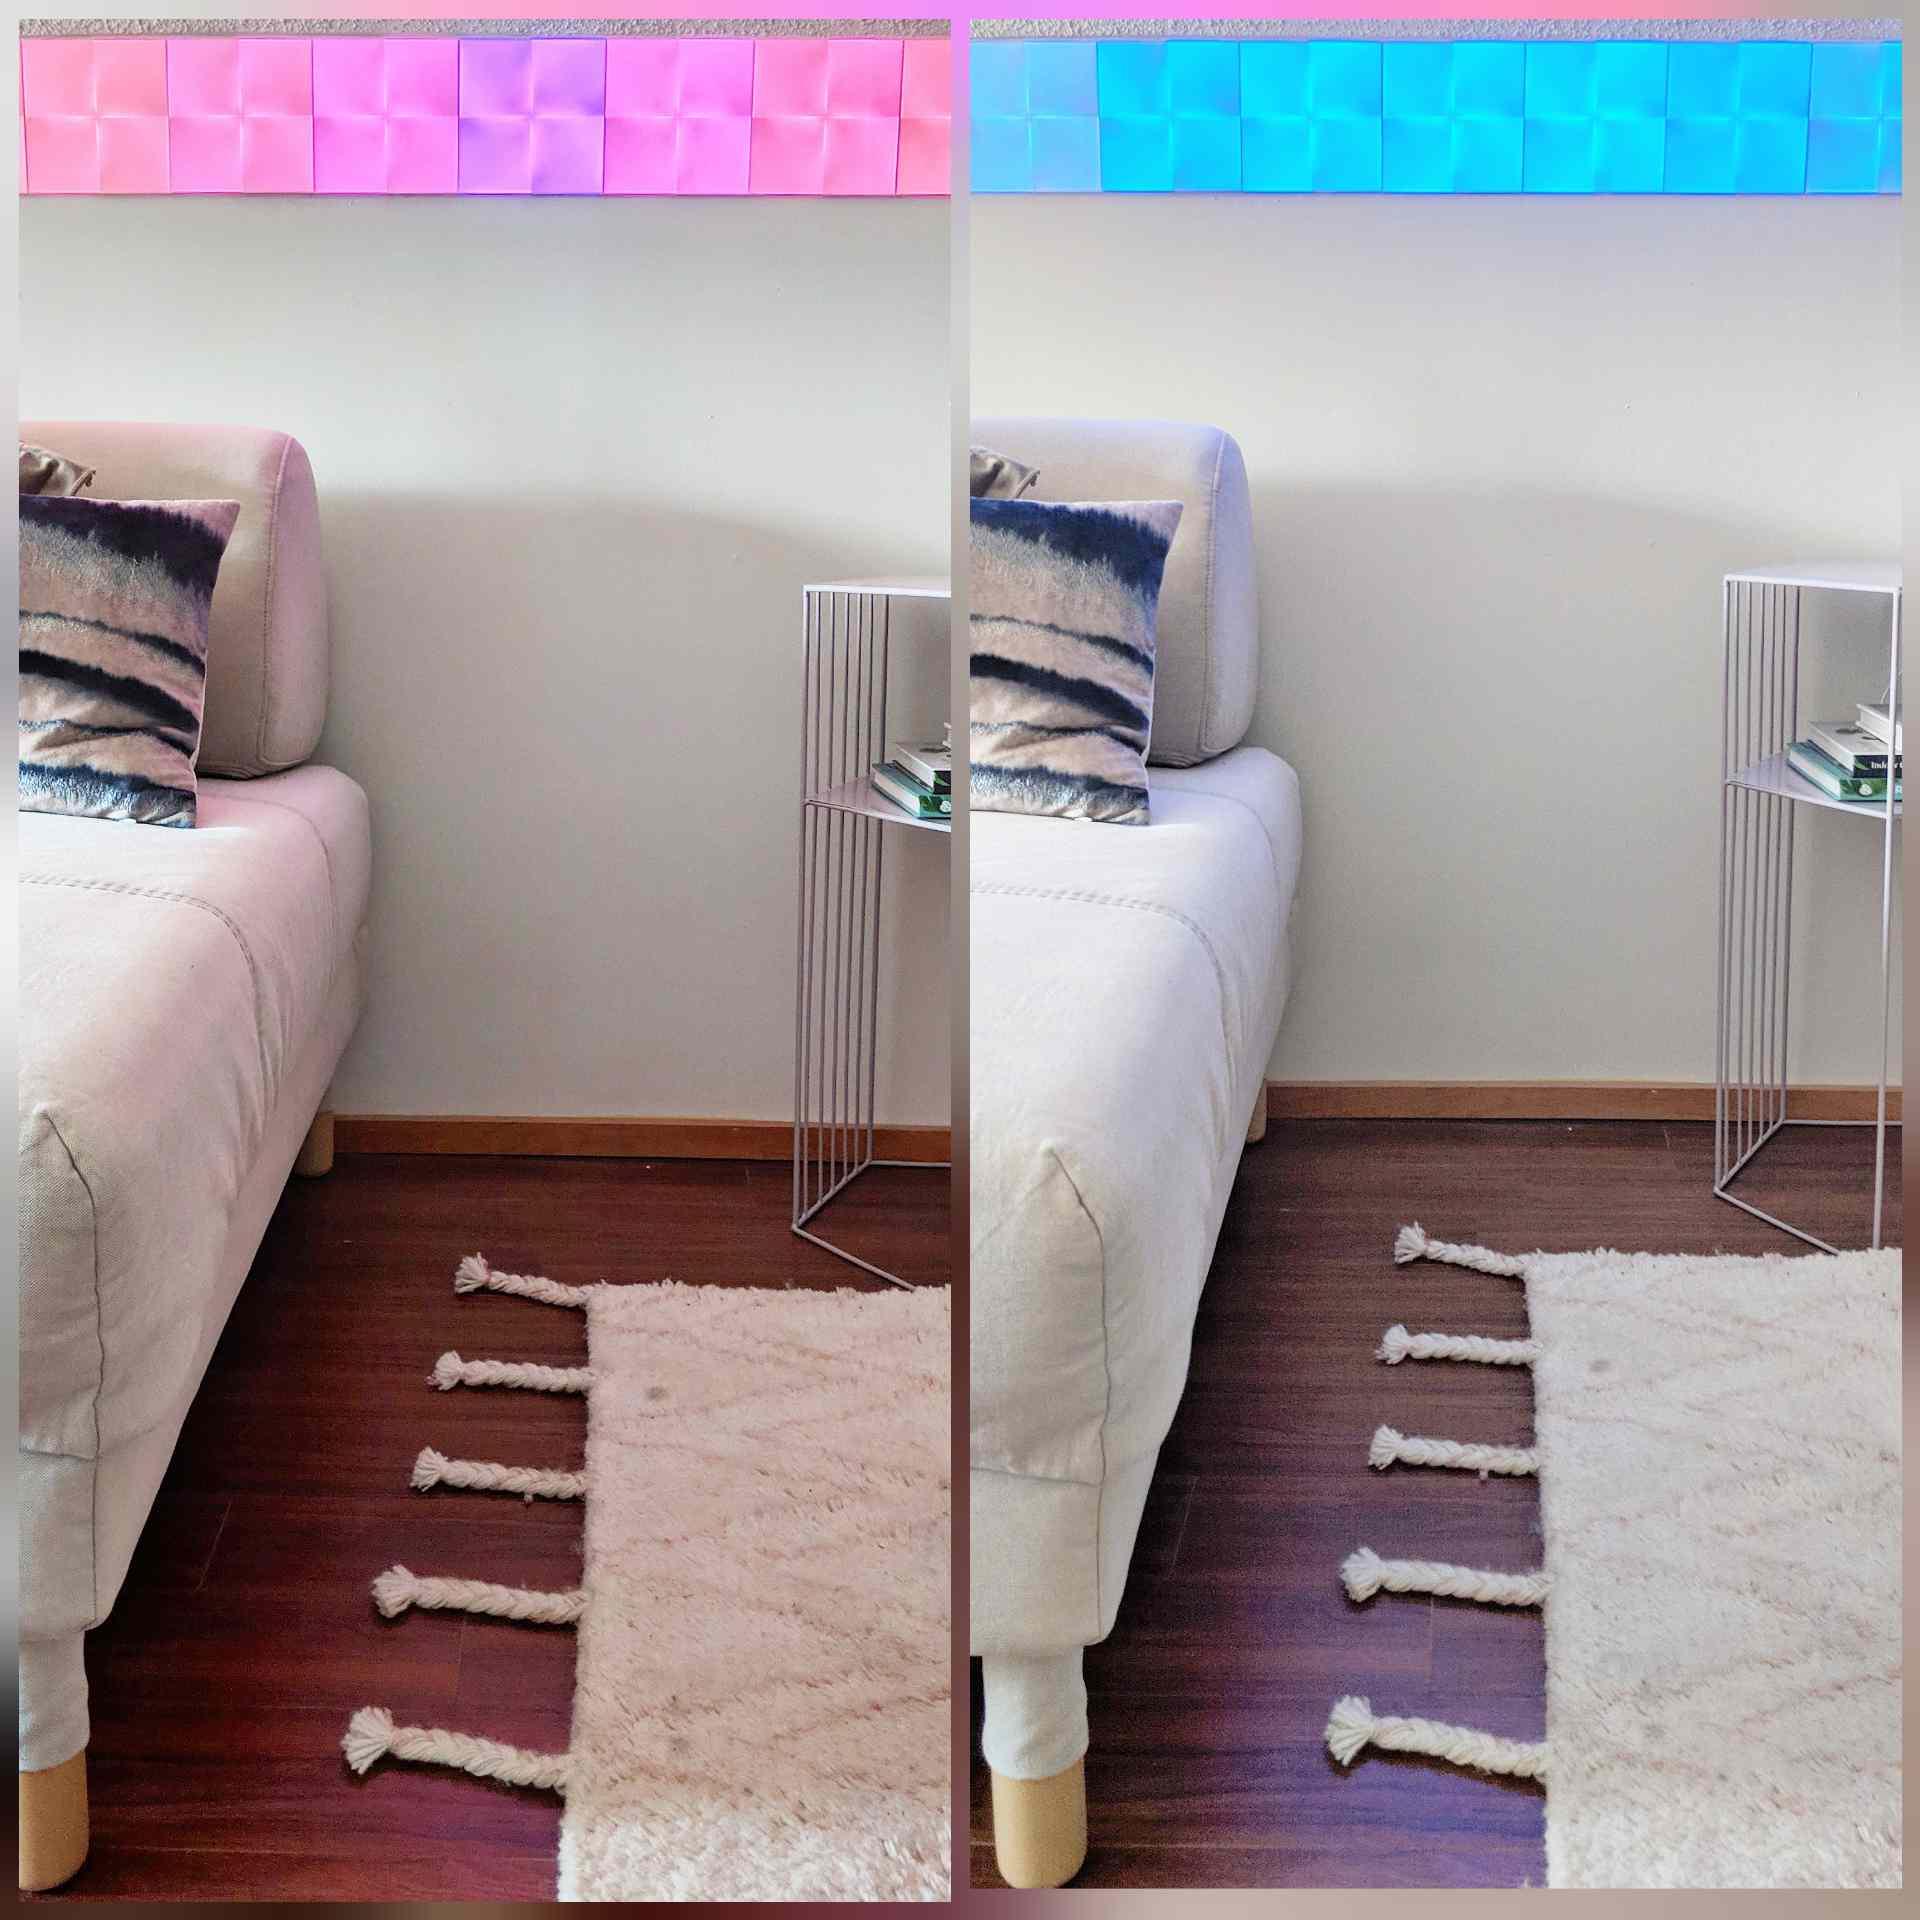 Nanoleaf Canvas lights mounted on wall